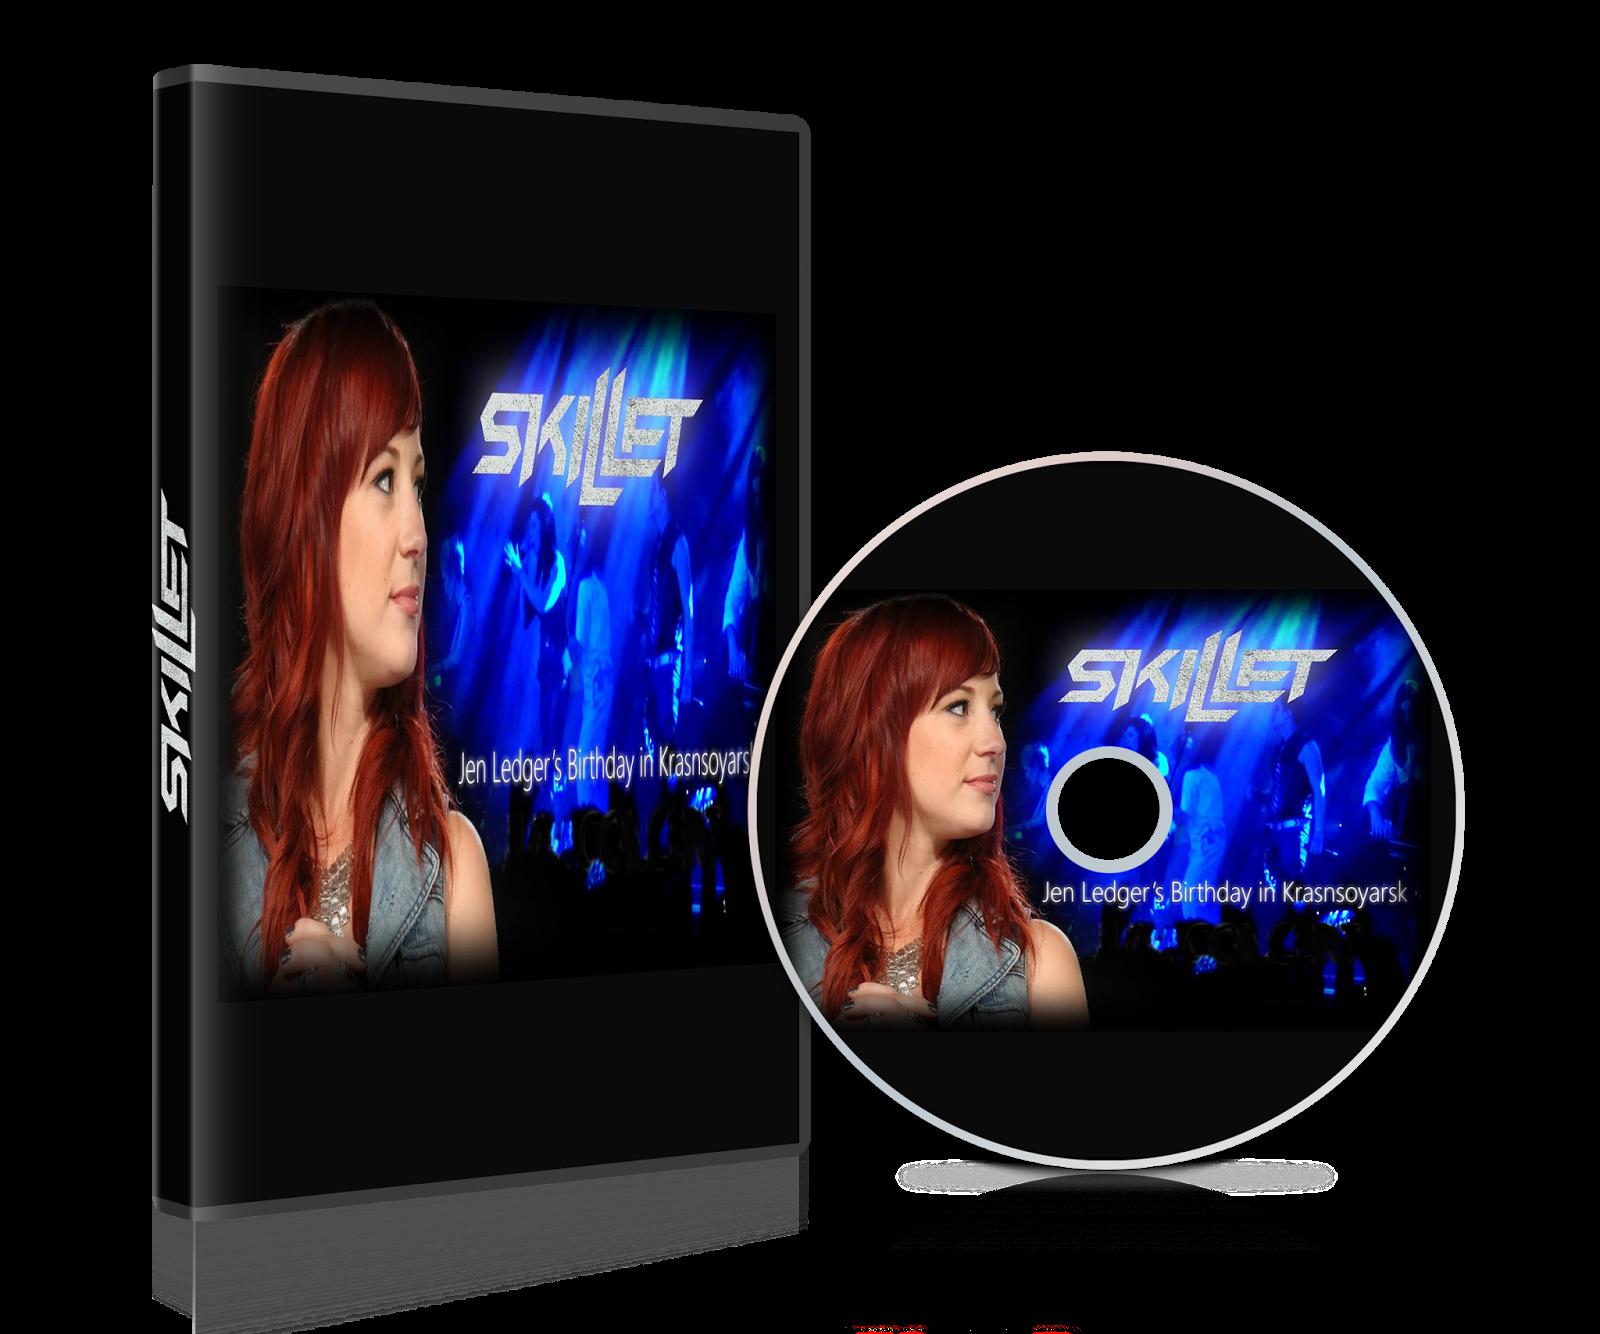 SKILLET (ROCK / NU METAL) ~ GOSPEL DOWNLOAD FREE